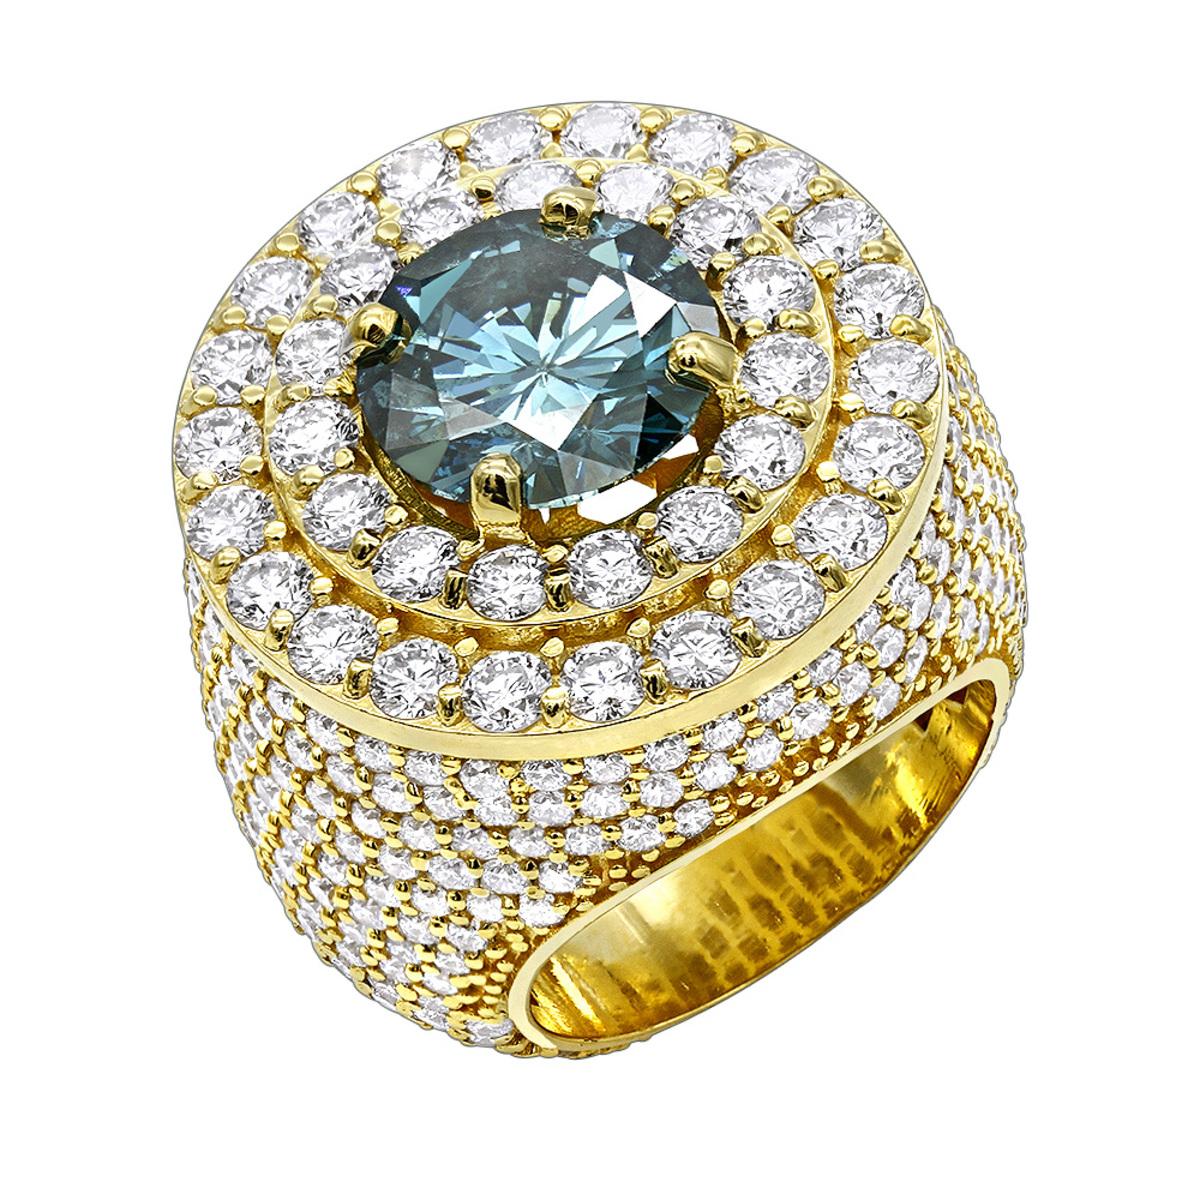 Luxurman Statement Jewelry 14K Gold Unique White Blue Diamond Mens Ring 11c